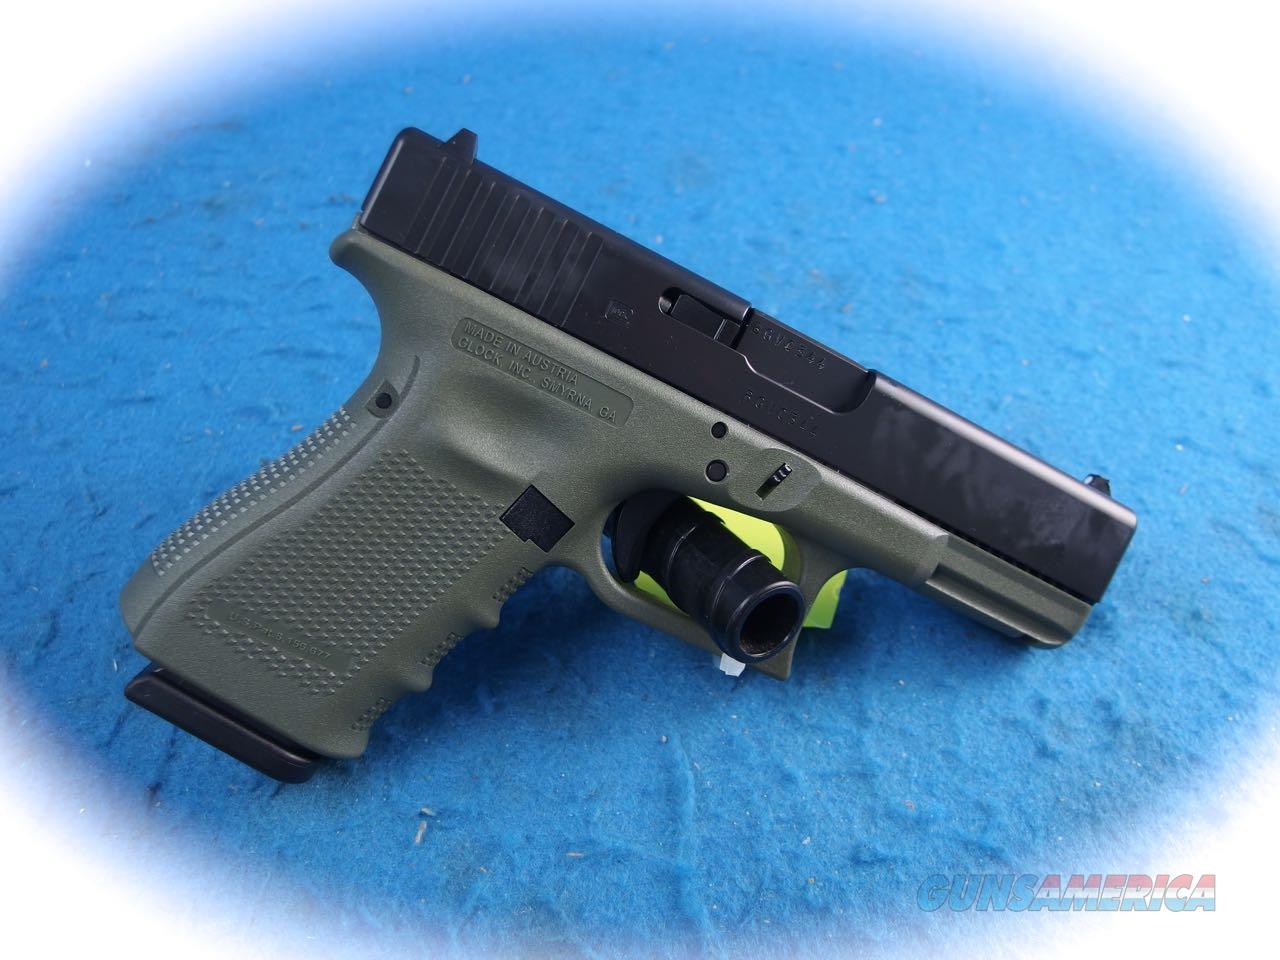 Glock 19 Gen 4 9mm Semi Auto Pistol Battlefield Green **New**  Guns > Pistols > Glock Pistols > 19